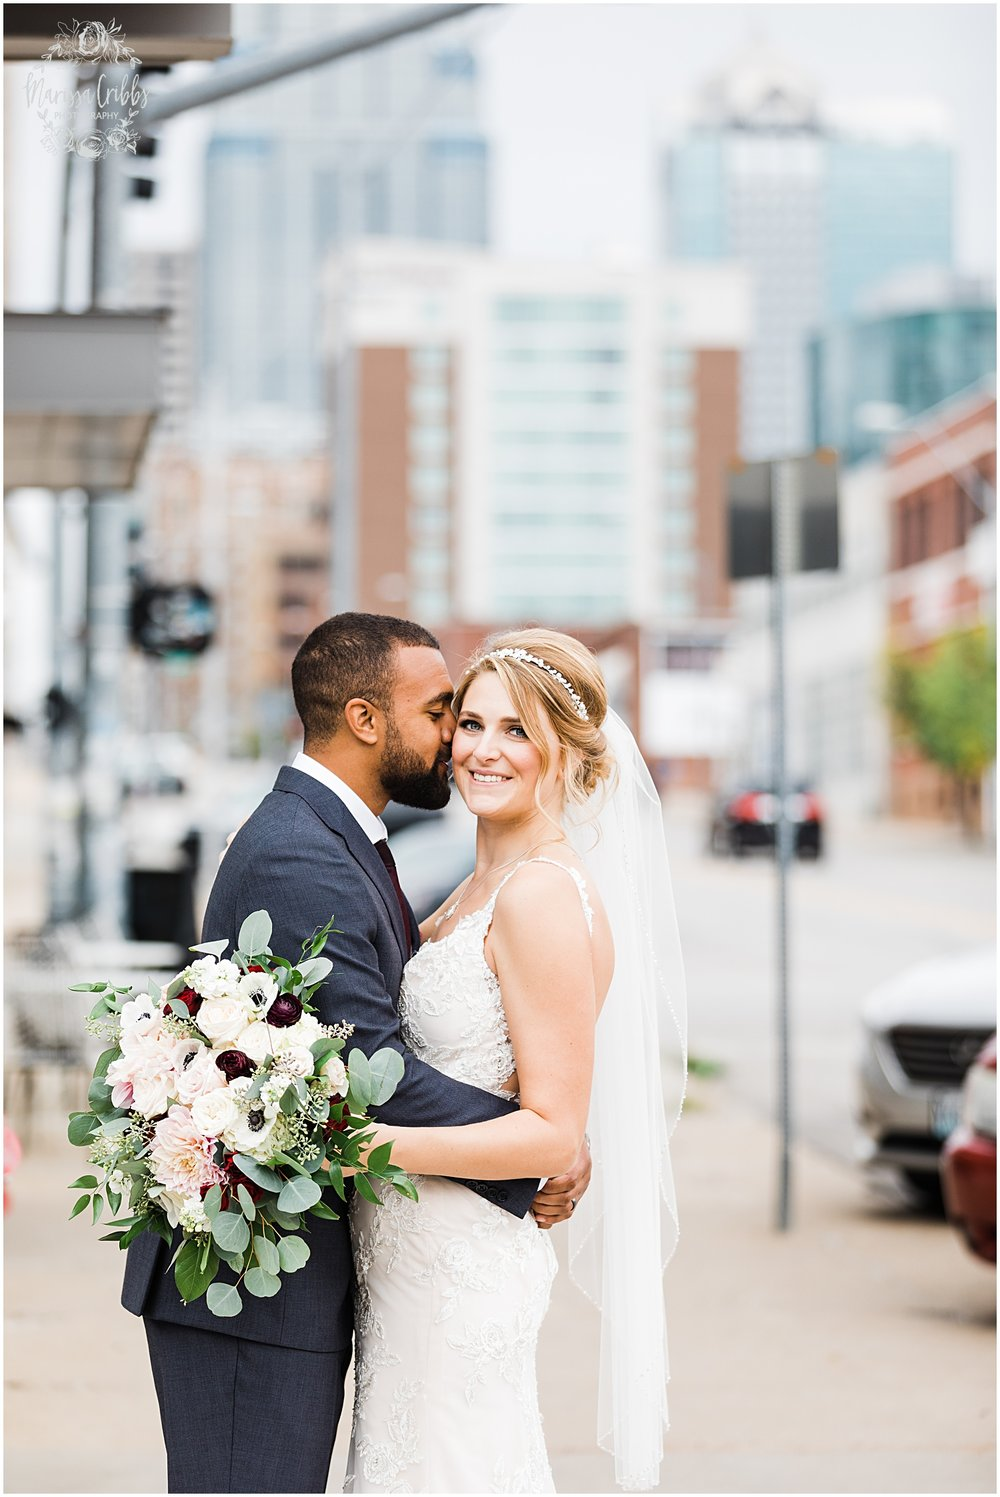 BAUER WEDDING | KELSEA & JUSTIN | MARISSA CRIBBS PHOTOGRAPHY_6530.jpg